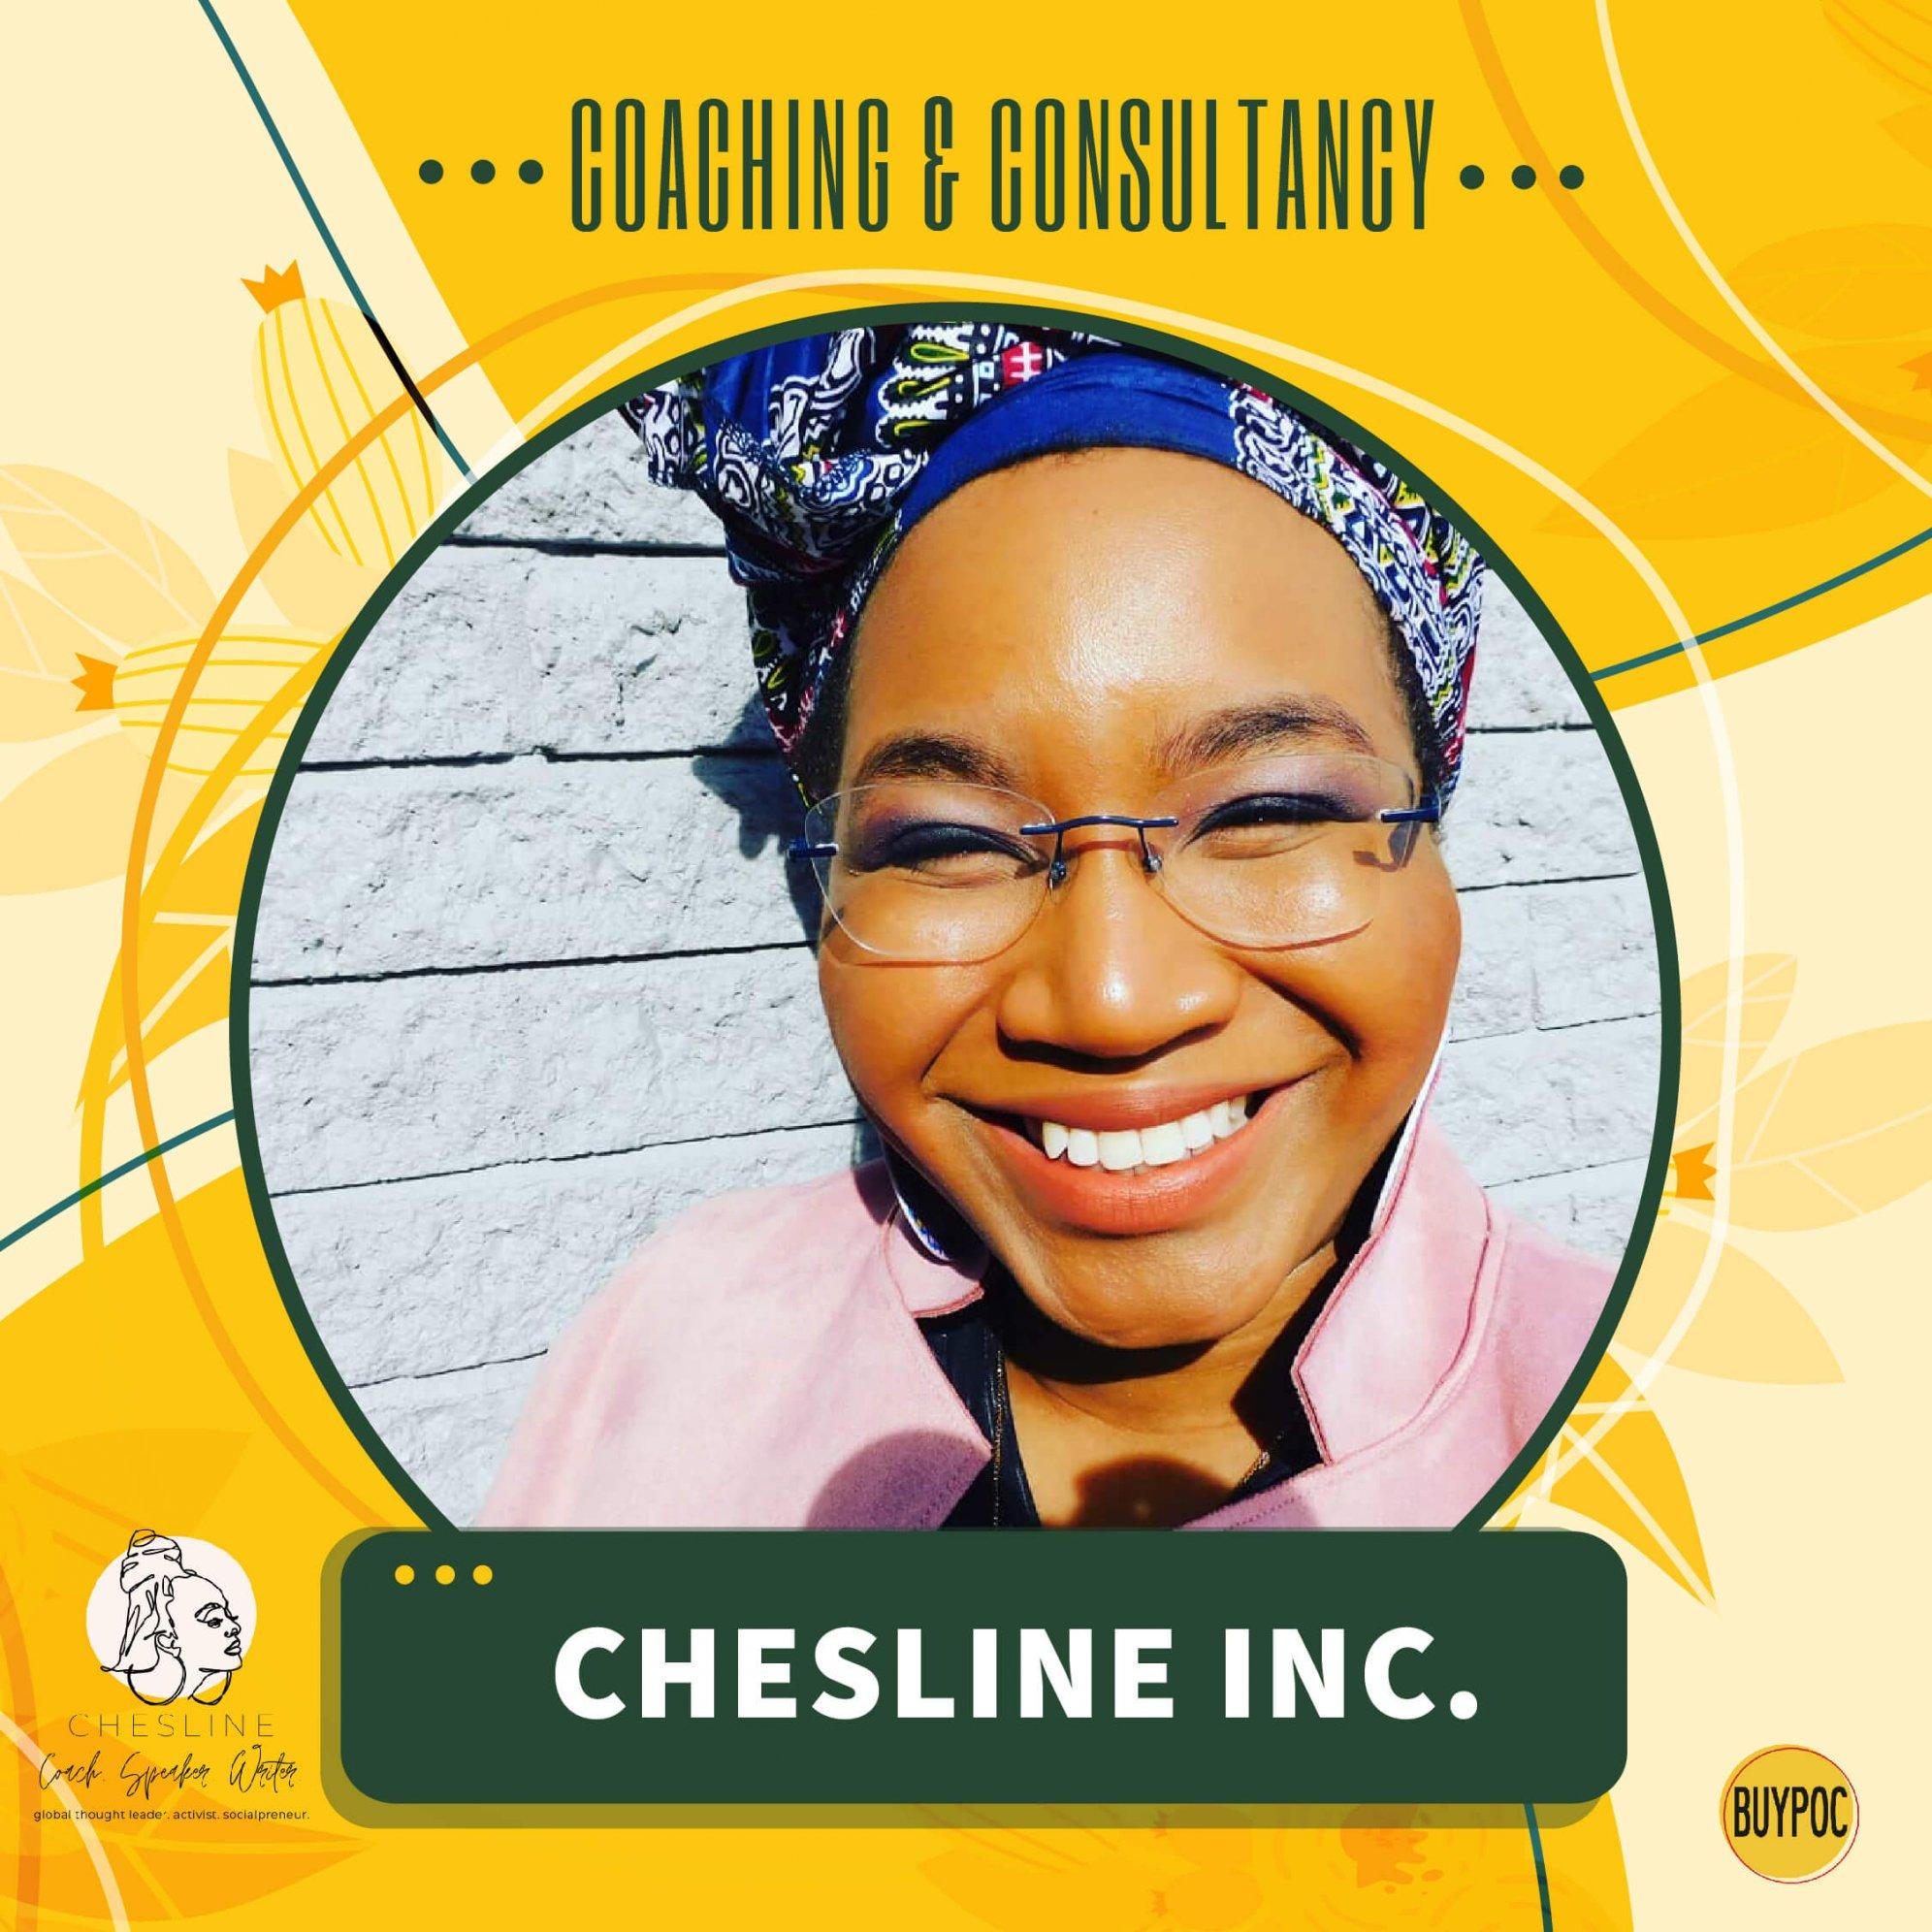 Chesline Inc.